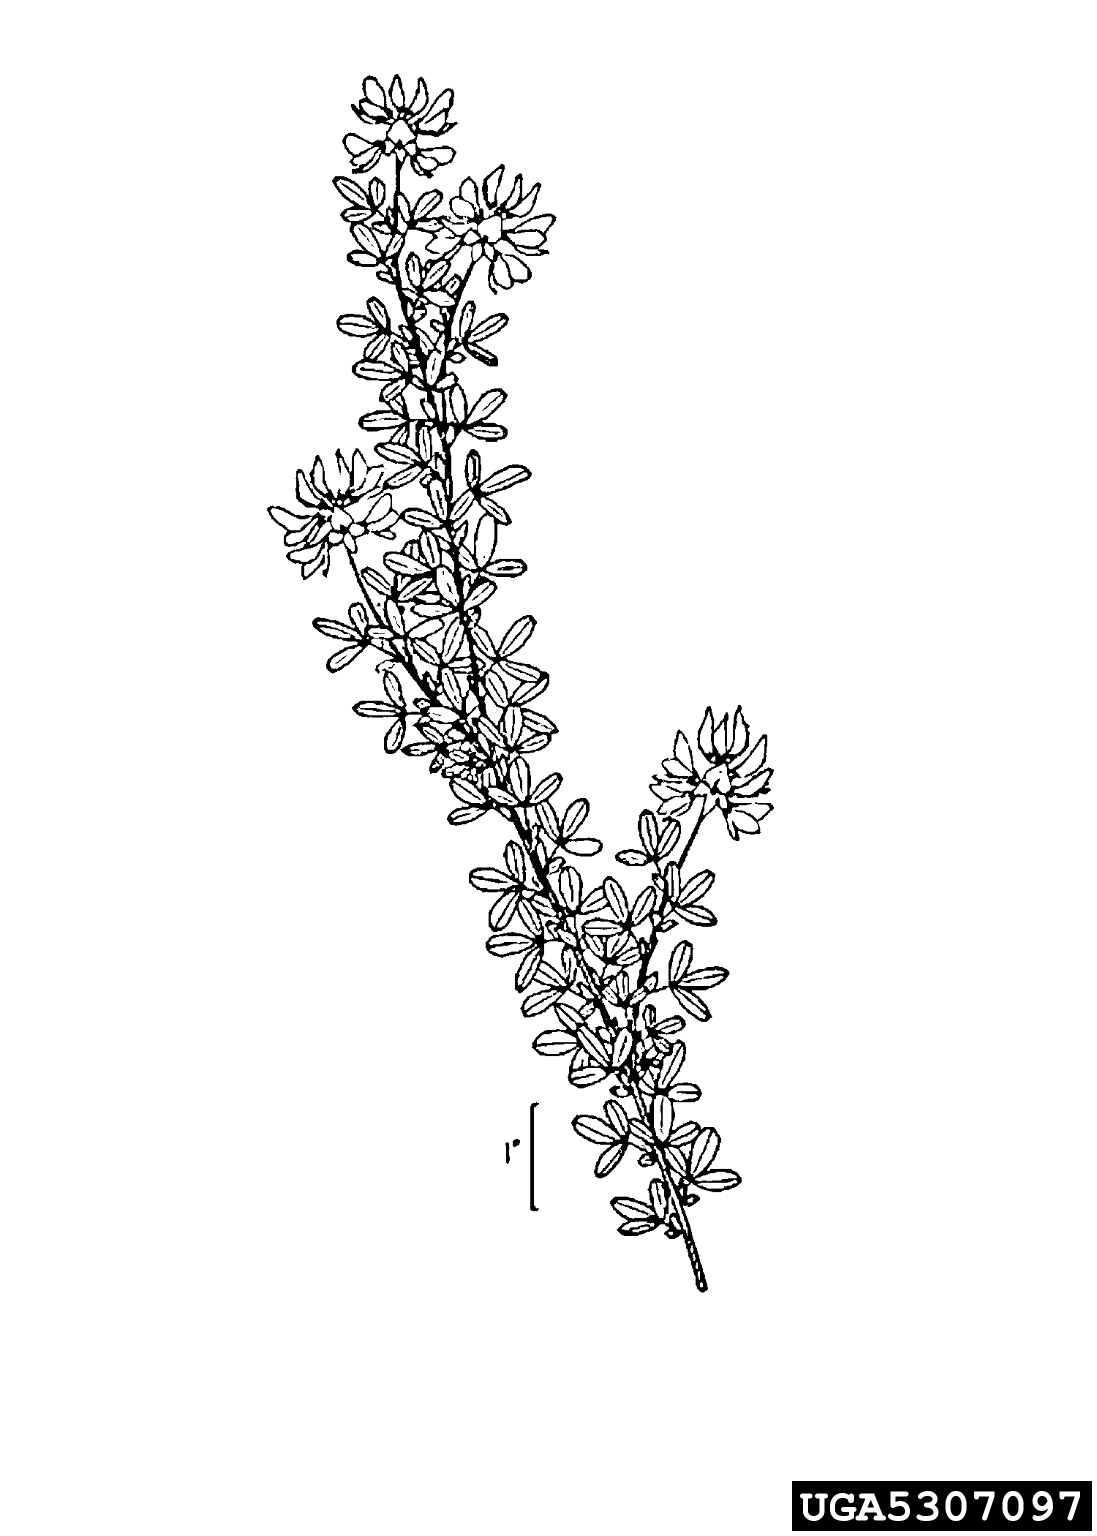 birdsfoot trefoil: Lotus corniculatus (Fabales: Fabaceae)